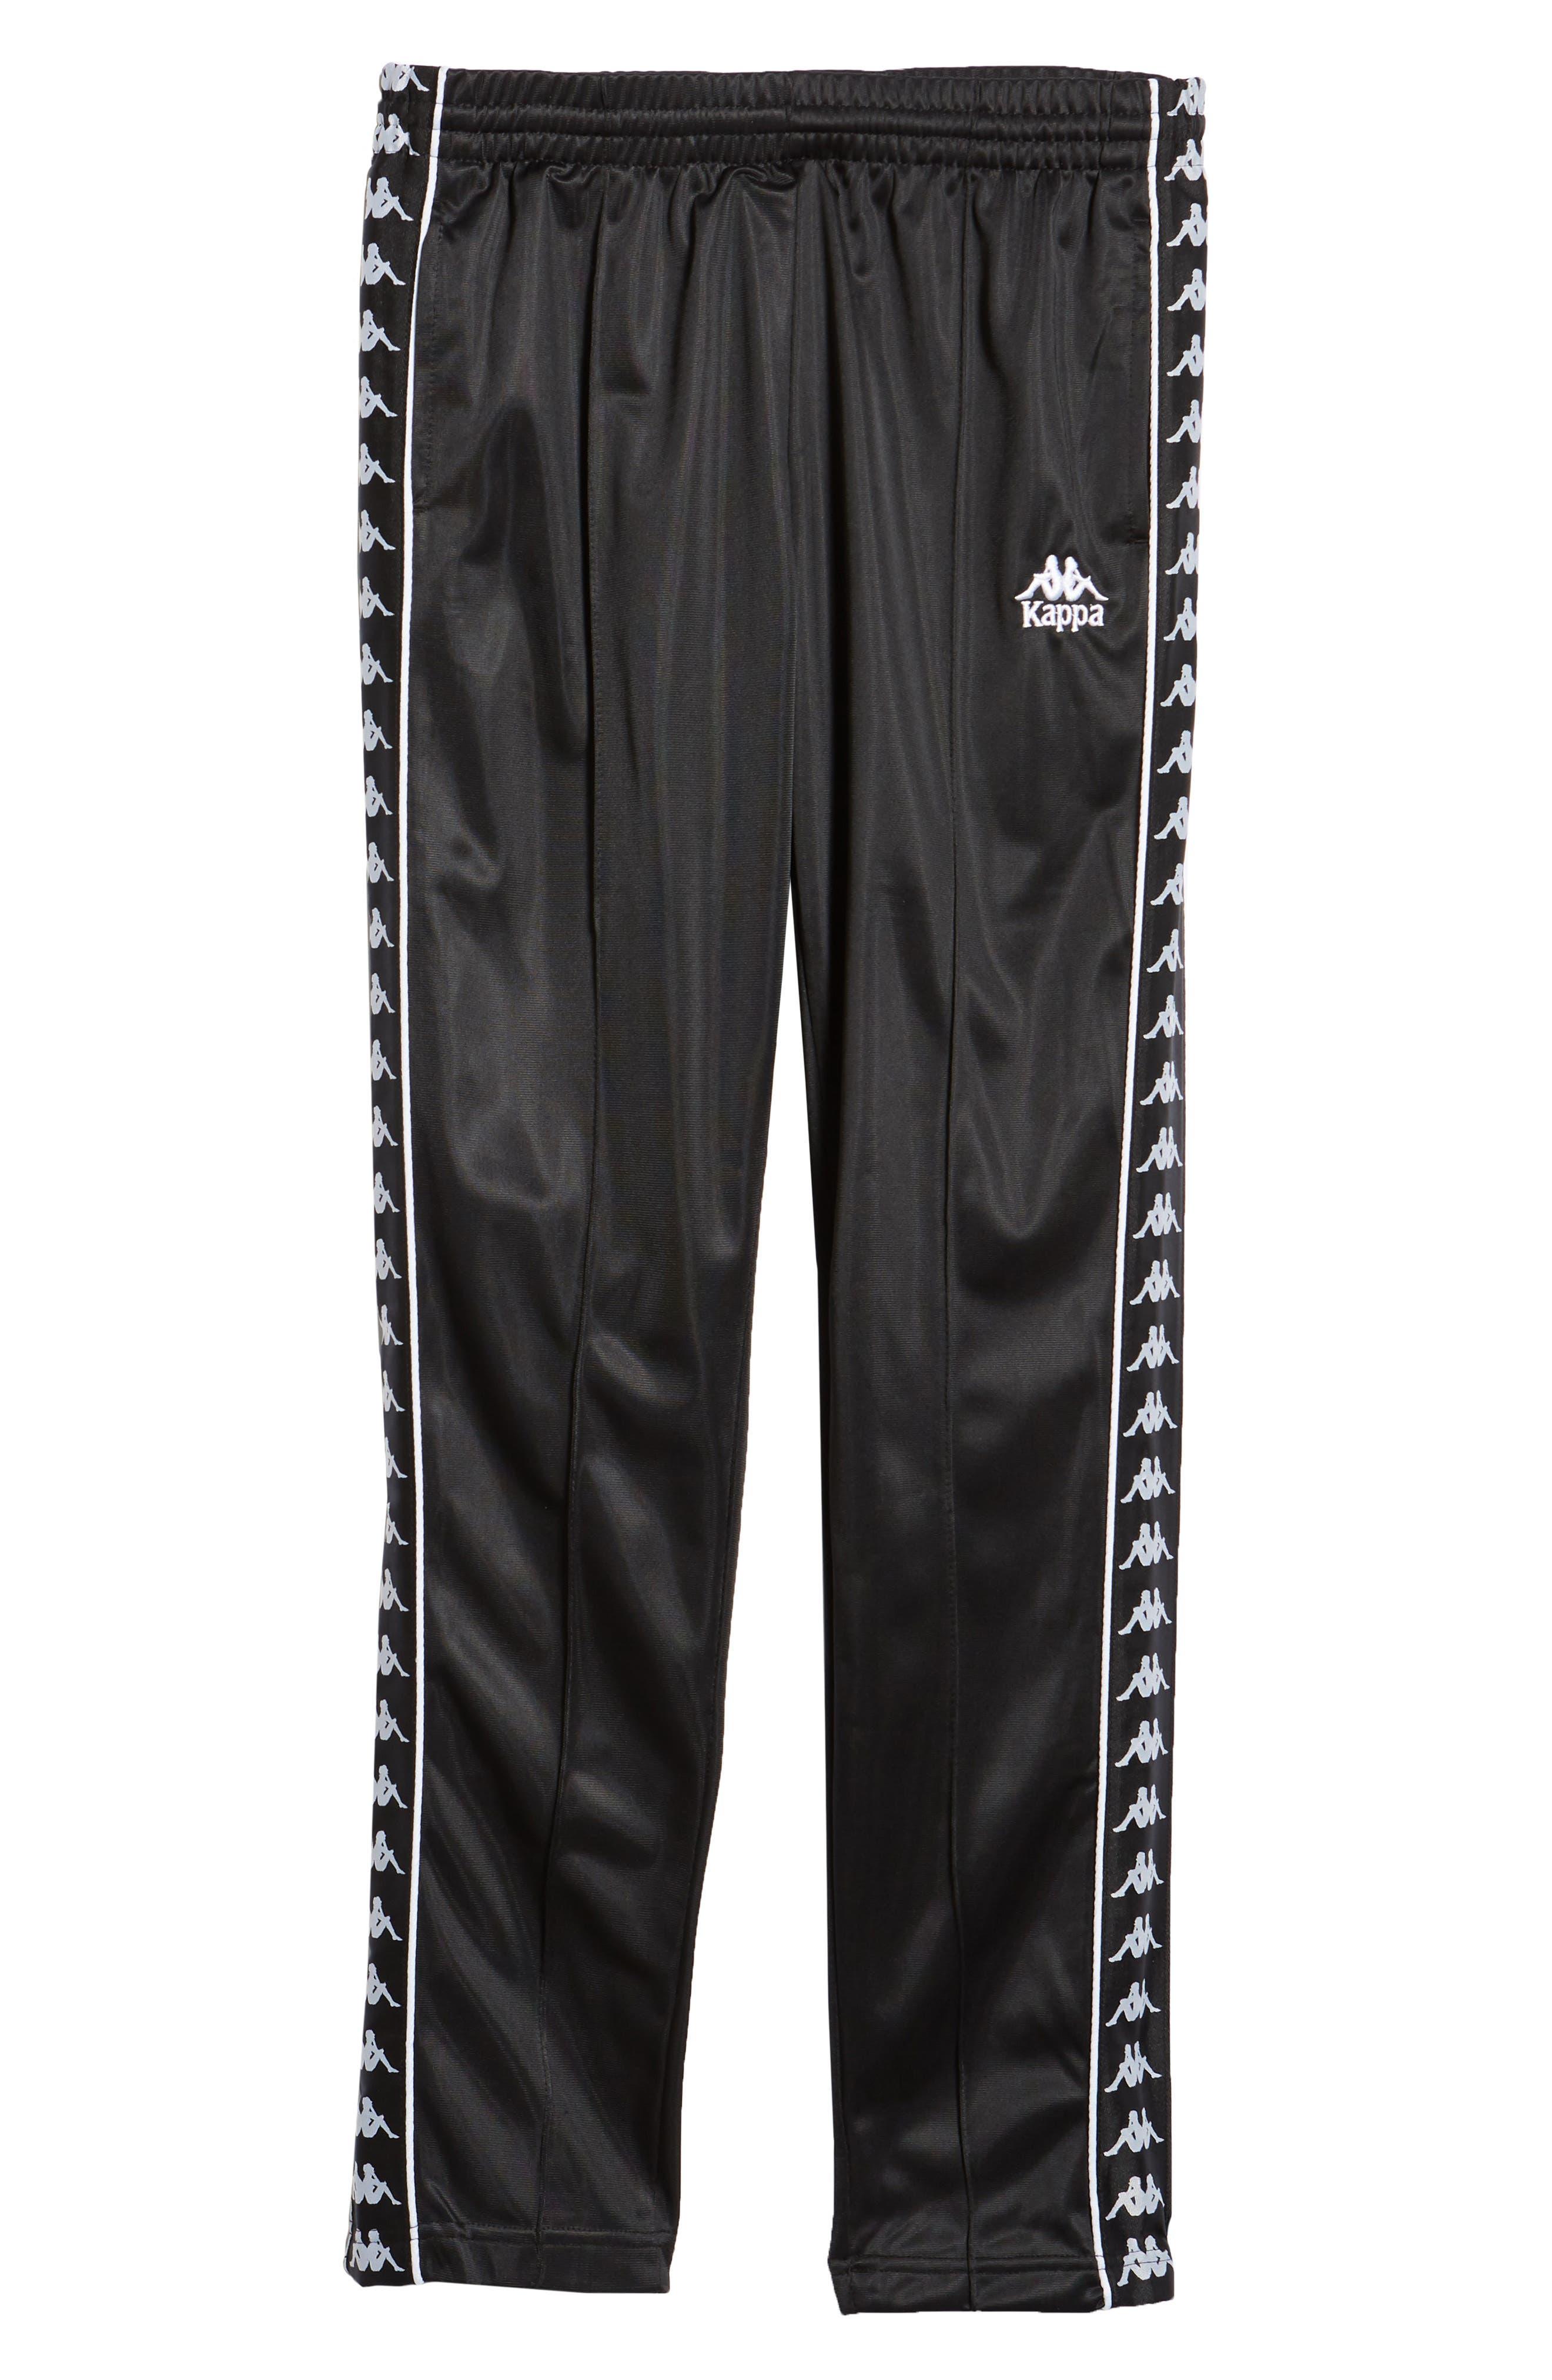 Authentic Fairfax Side Stripe Slim Track Pants,                             Alternate thumbnail 6, color,                             BLACK/ WHITE